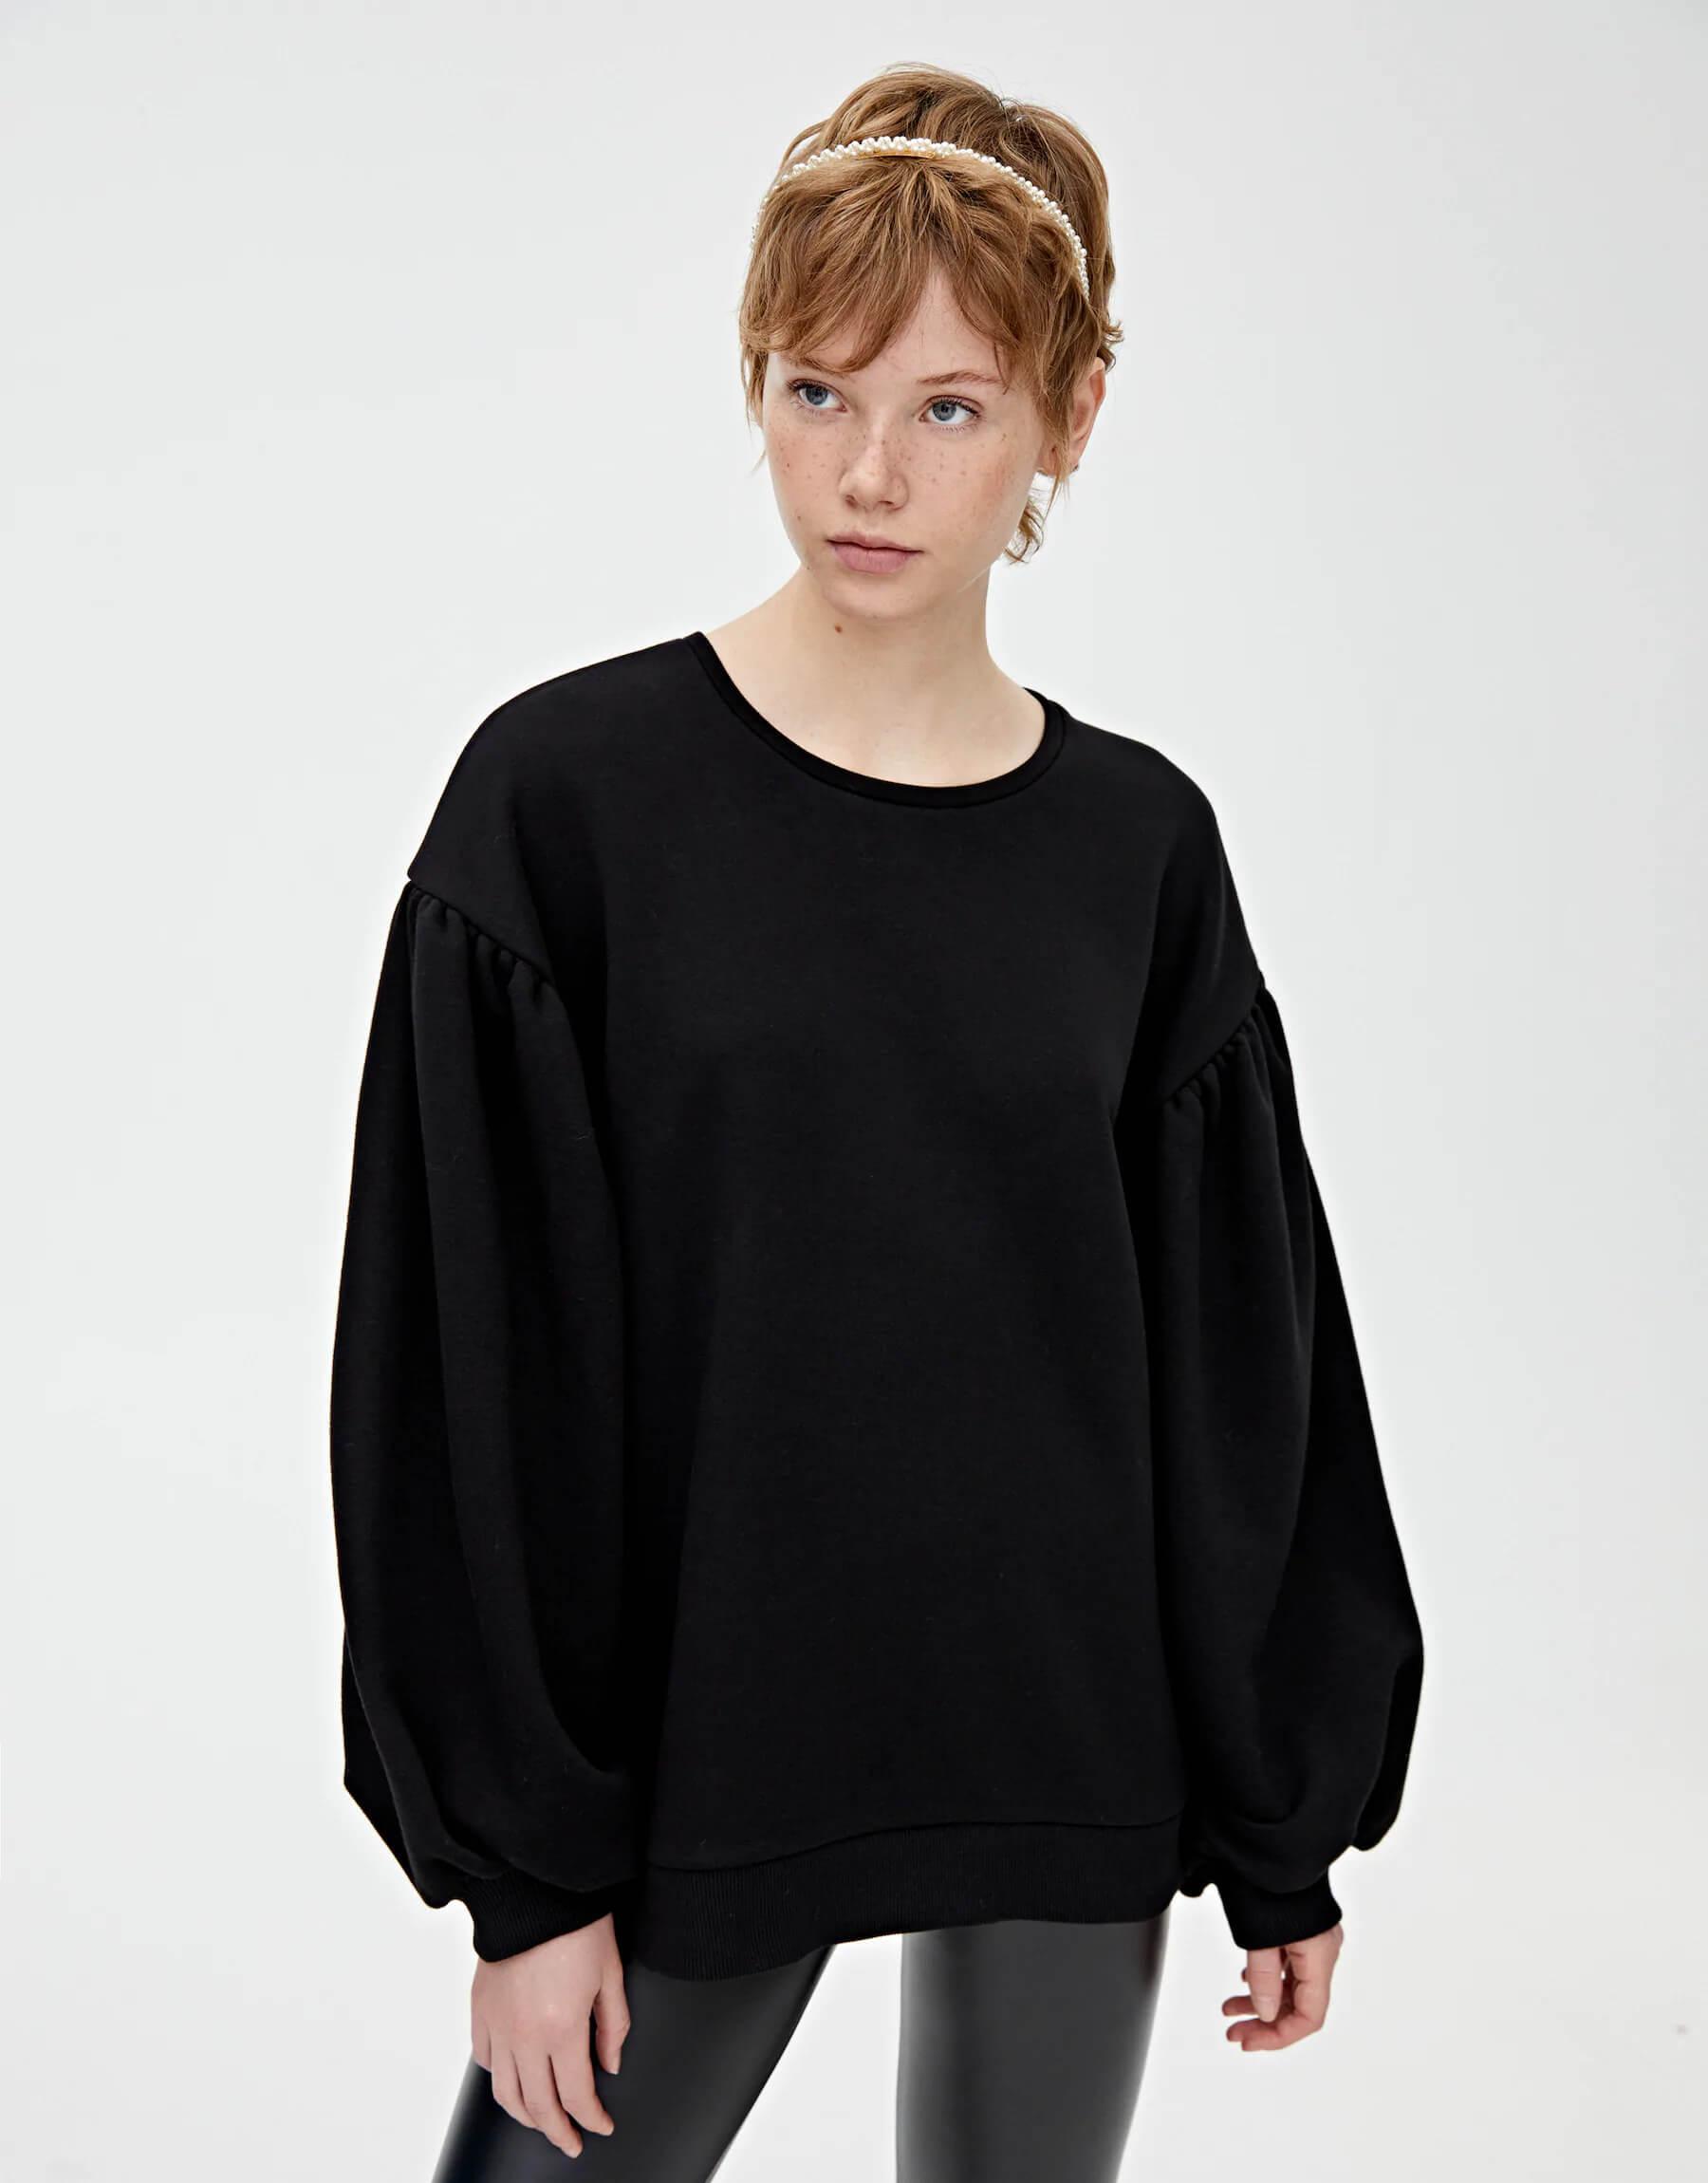 Pull and Bear Kadın Sweatshirt